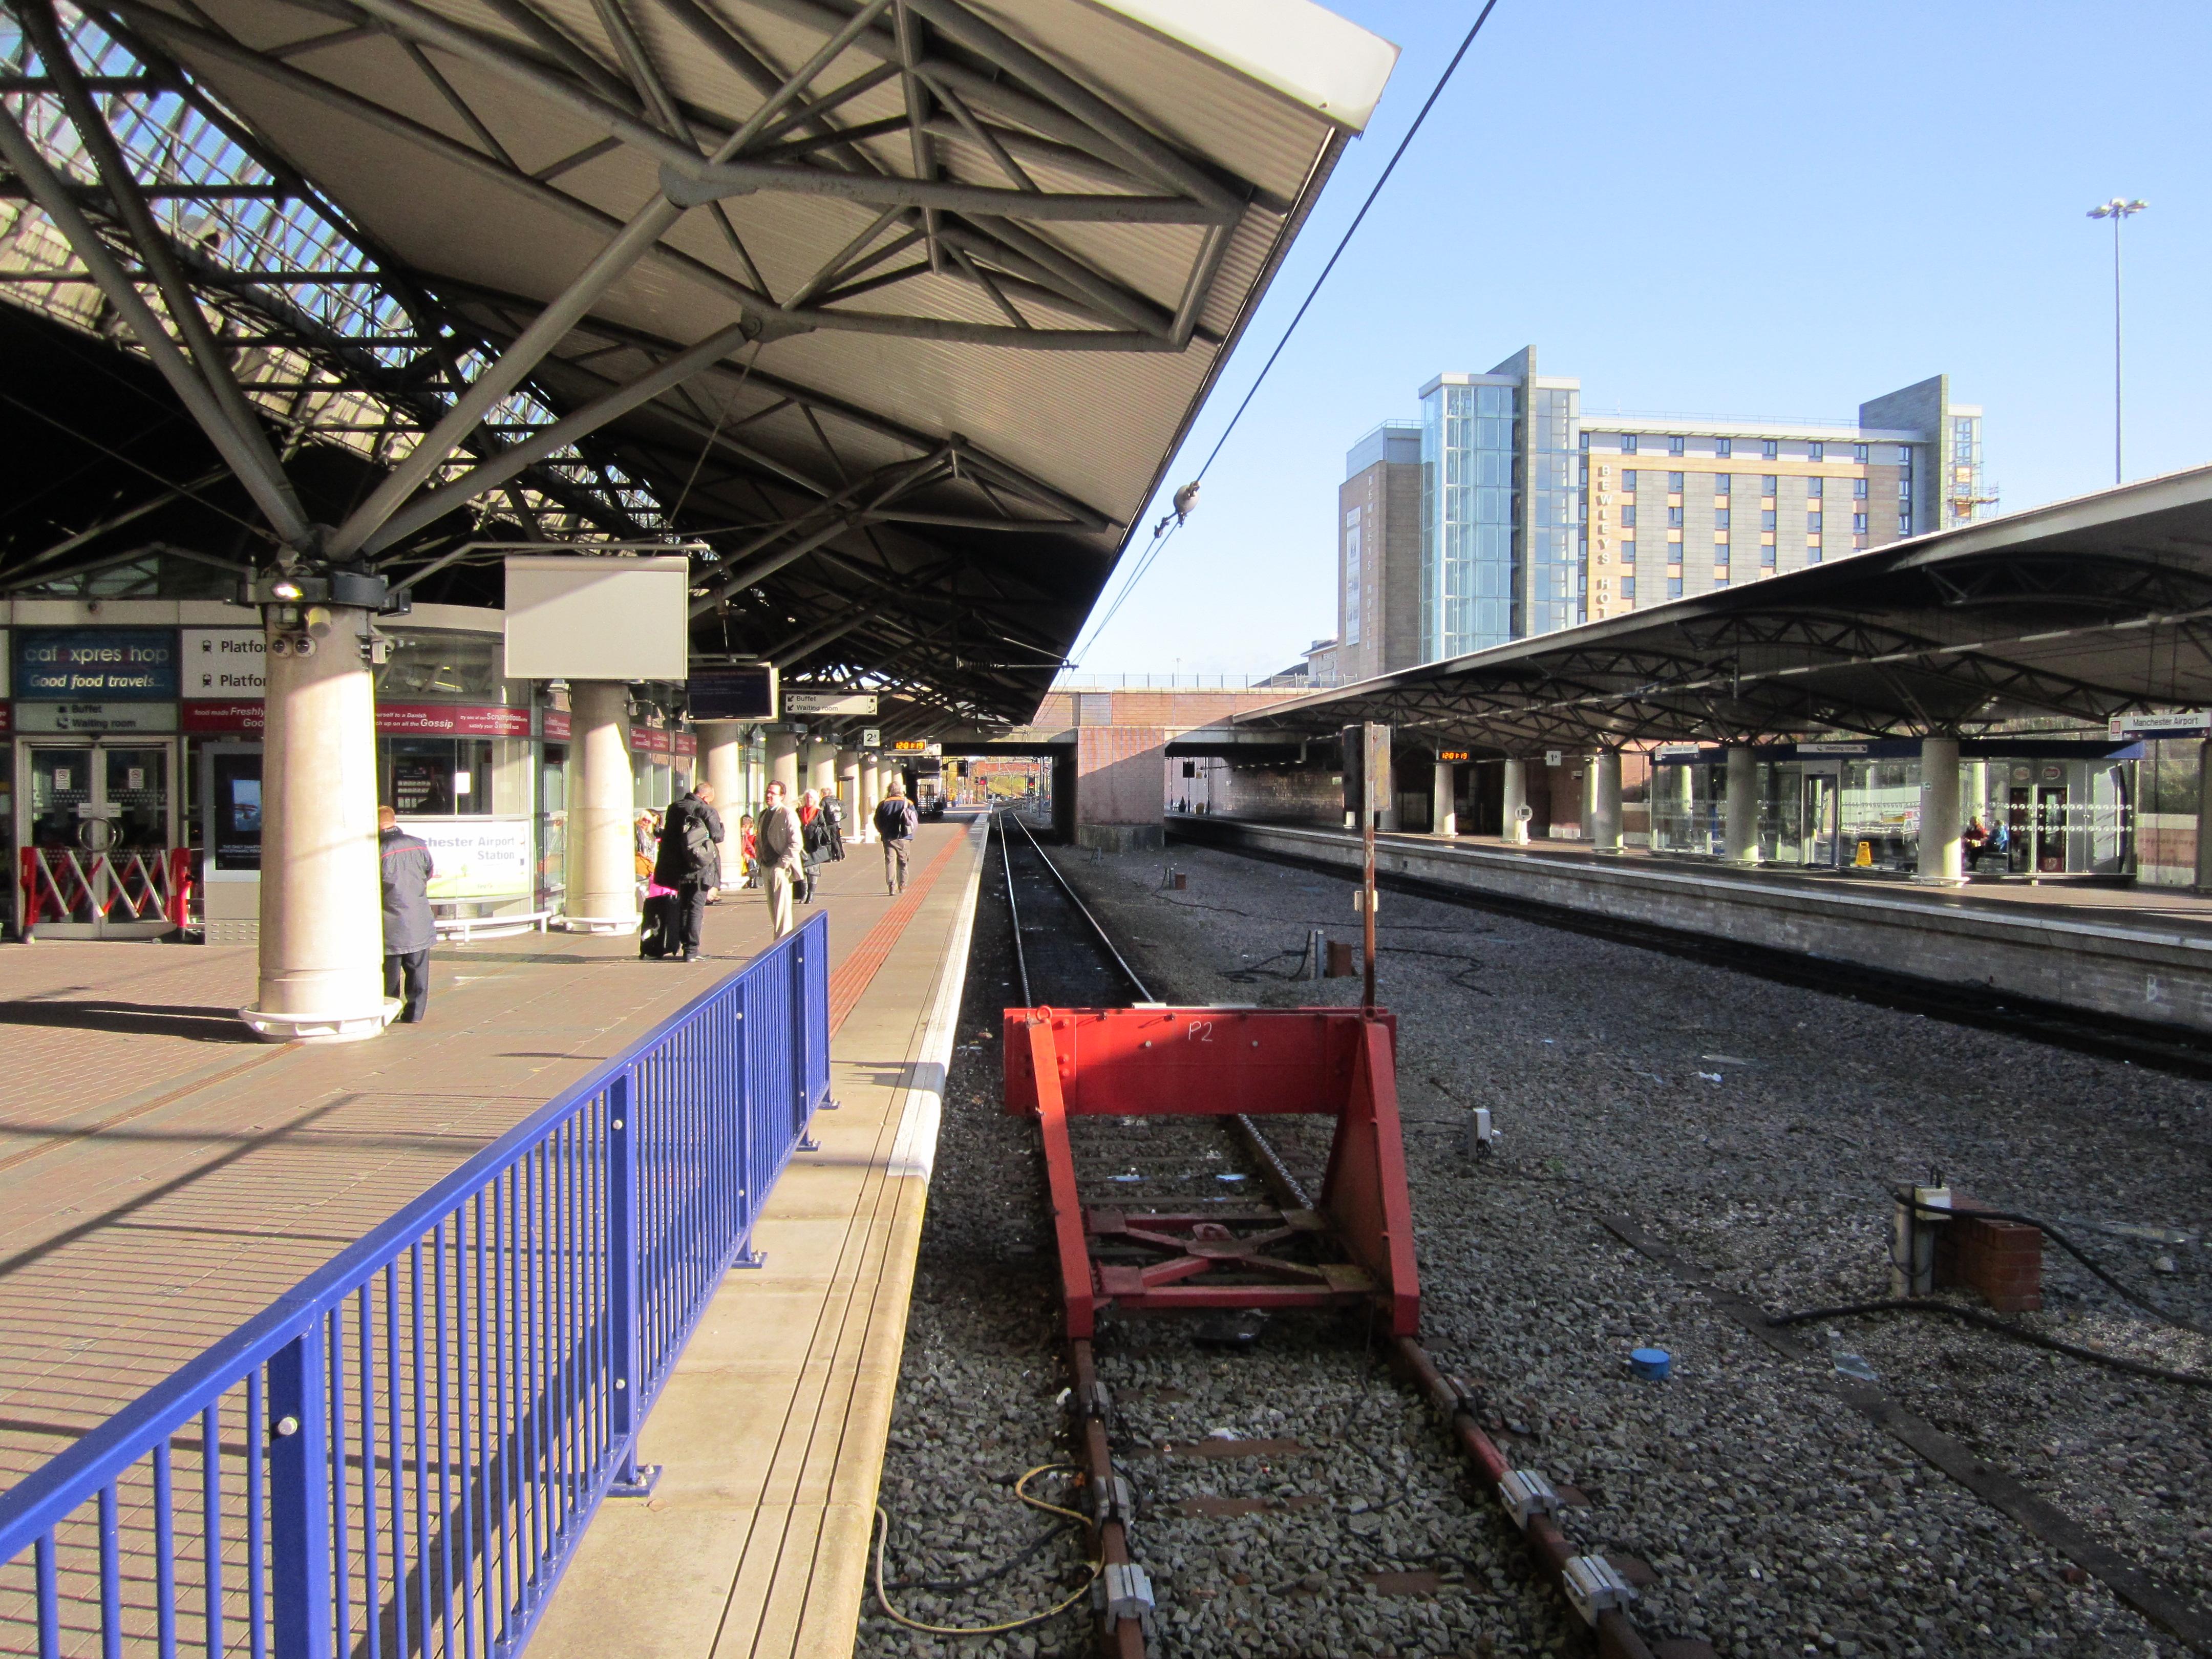 File:Manchester Airport railway station (1) jpg - Wikimedia